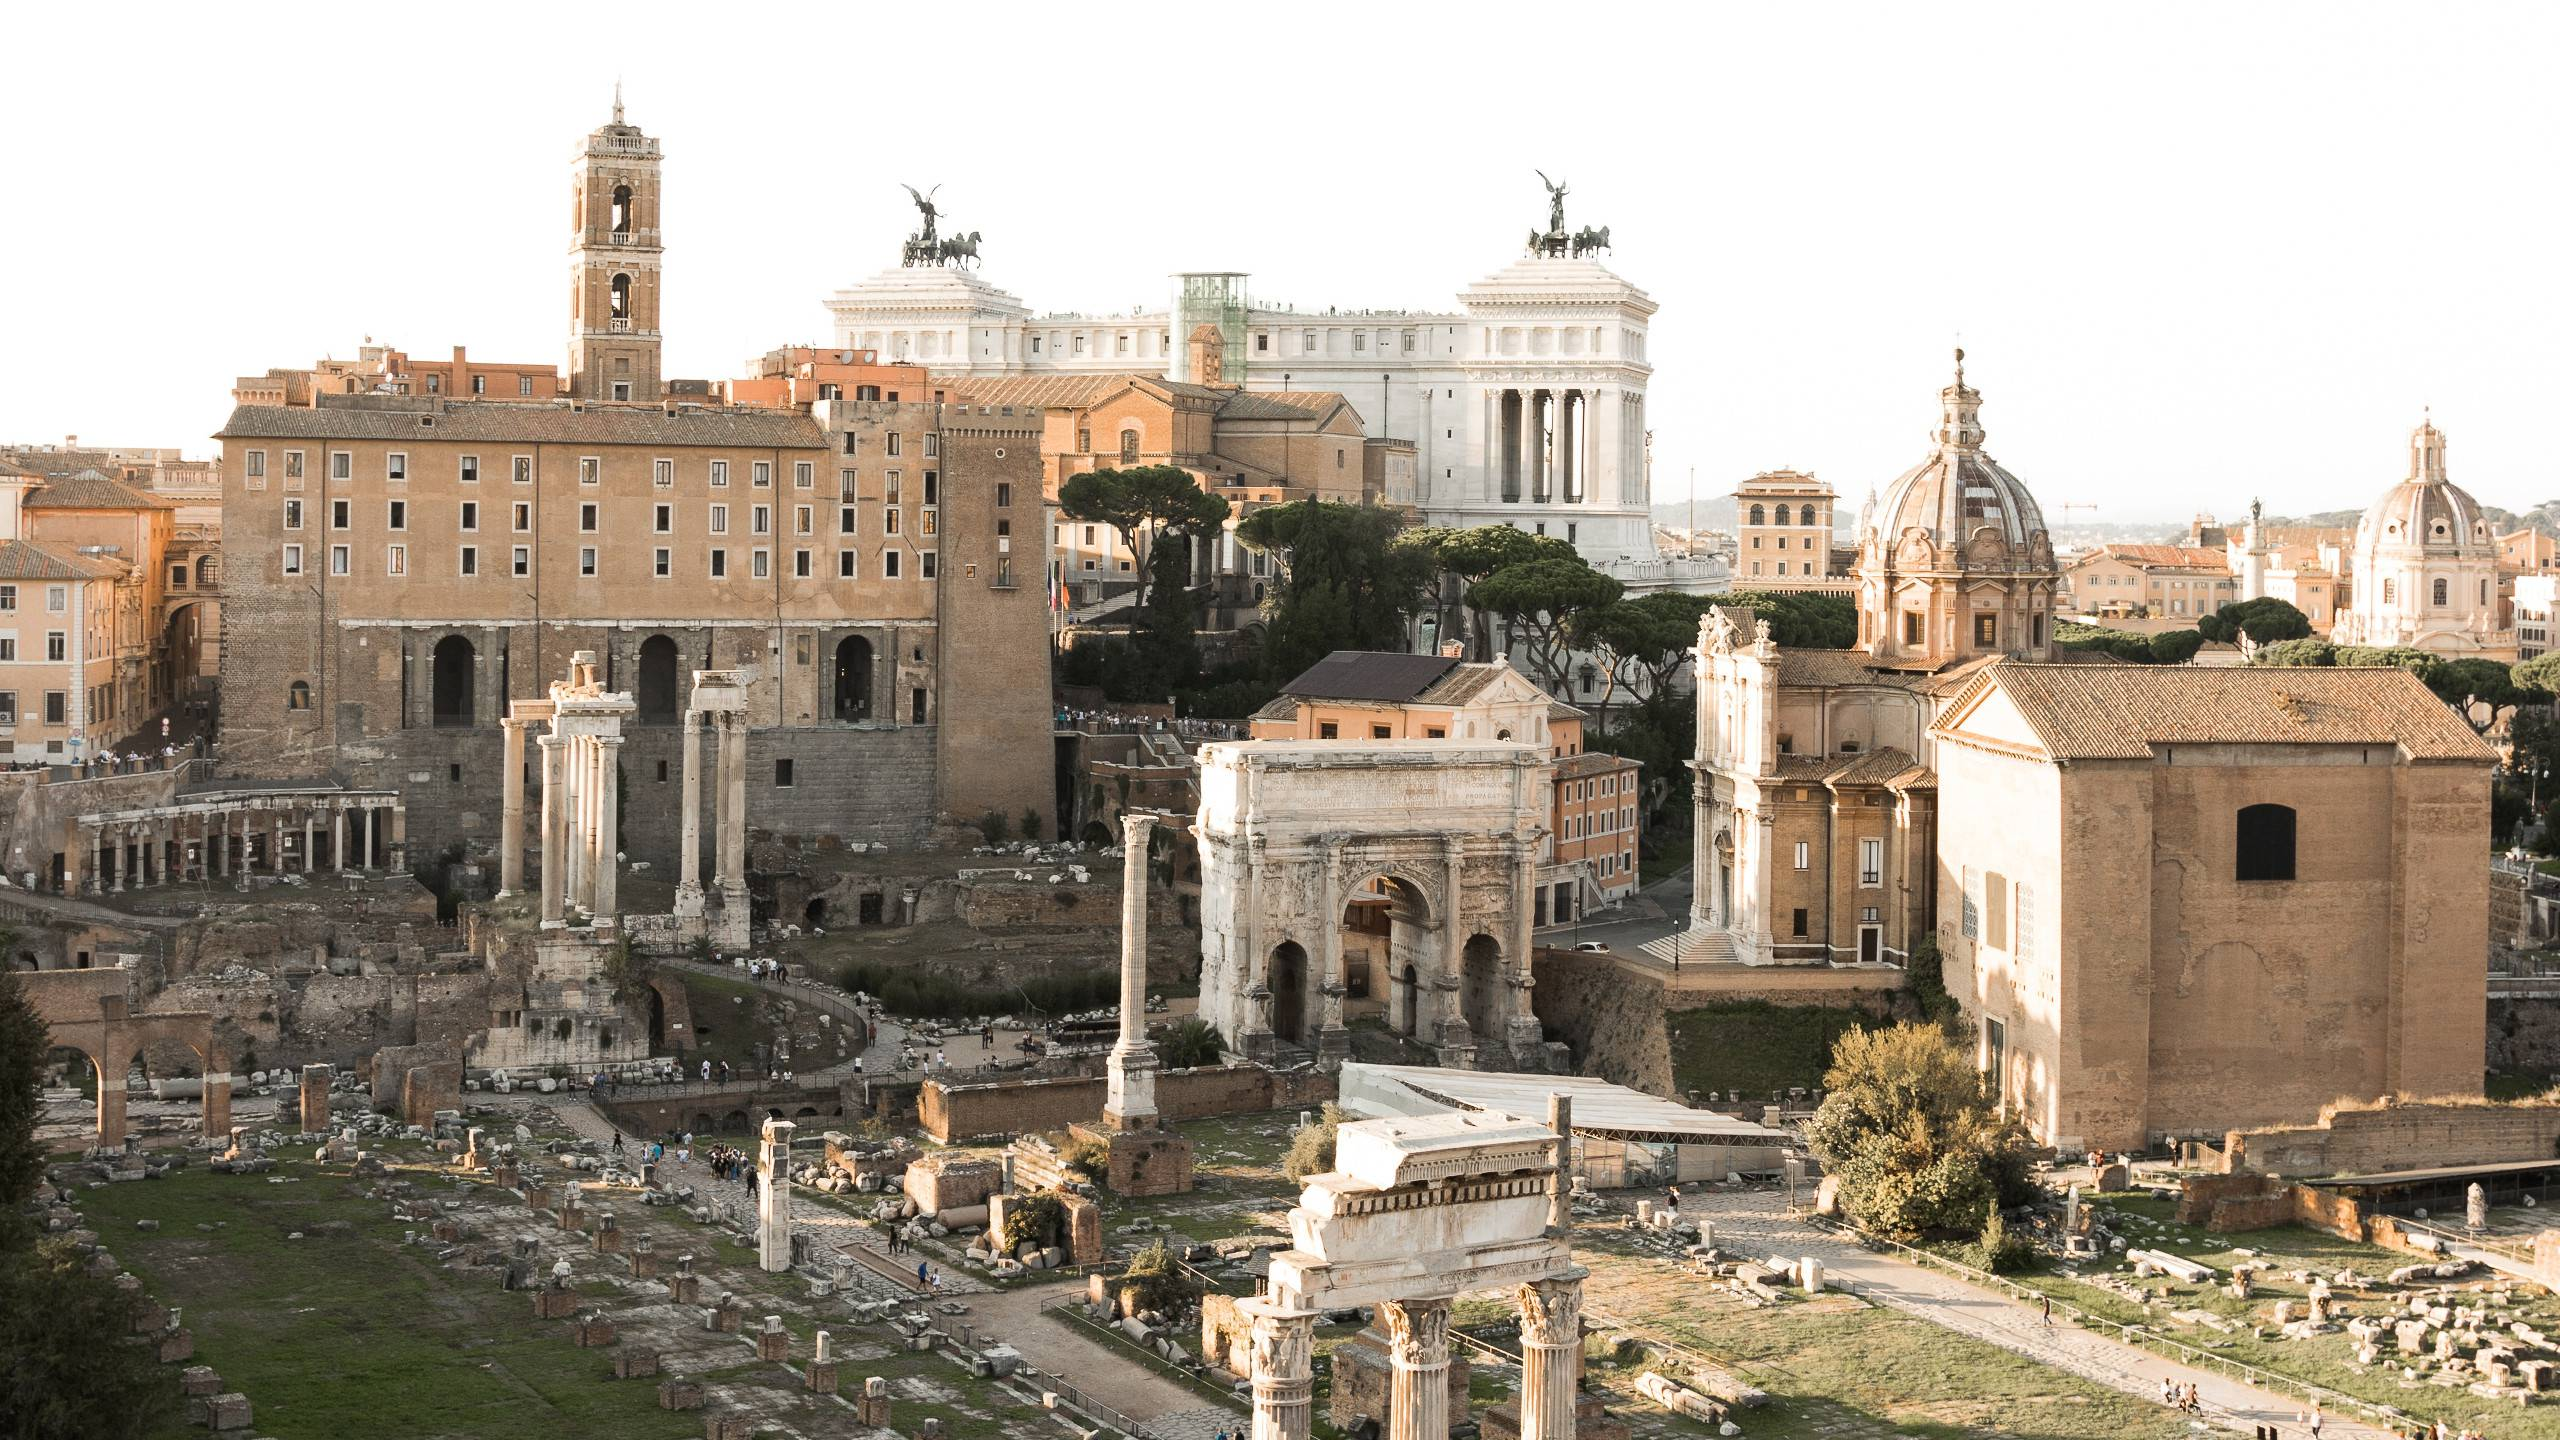 LBH-Roma-Luxus-Hotel-foro-romano-1120560-unsplash